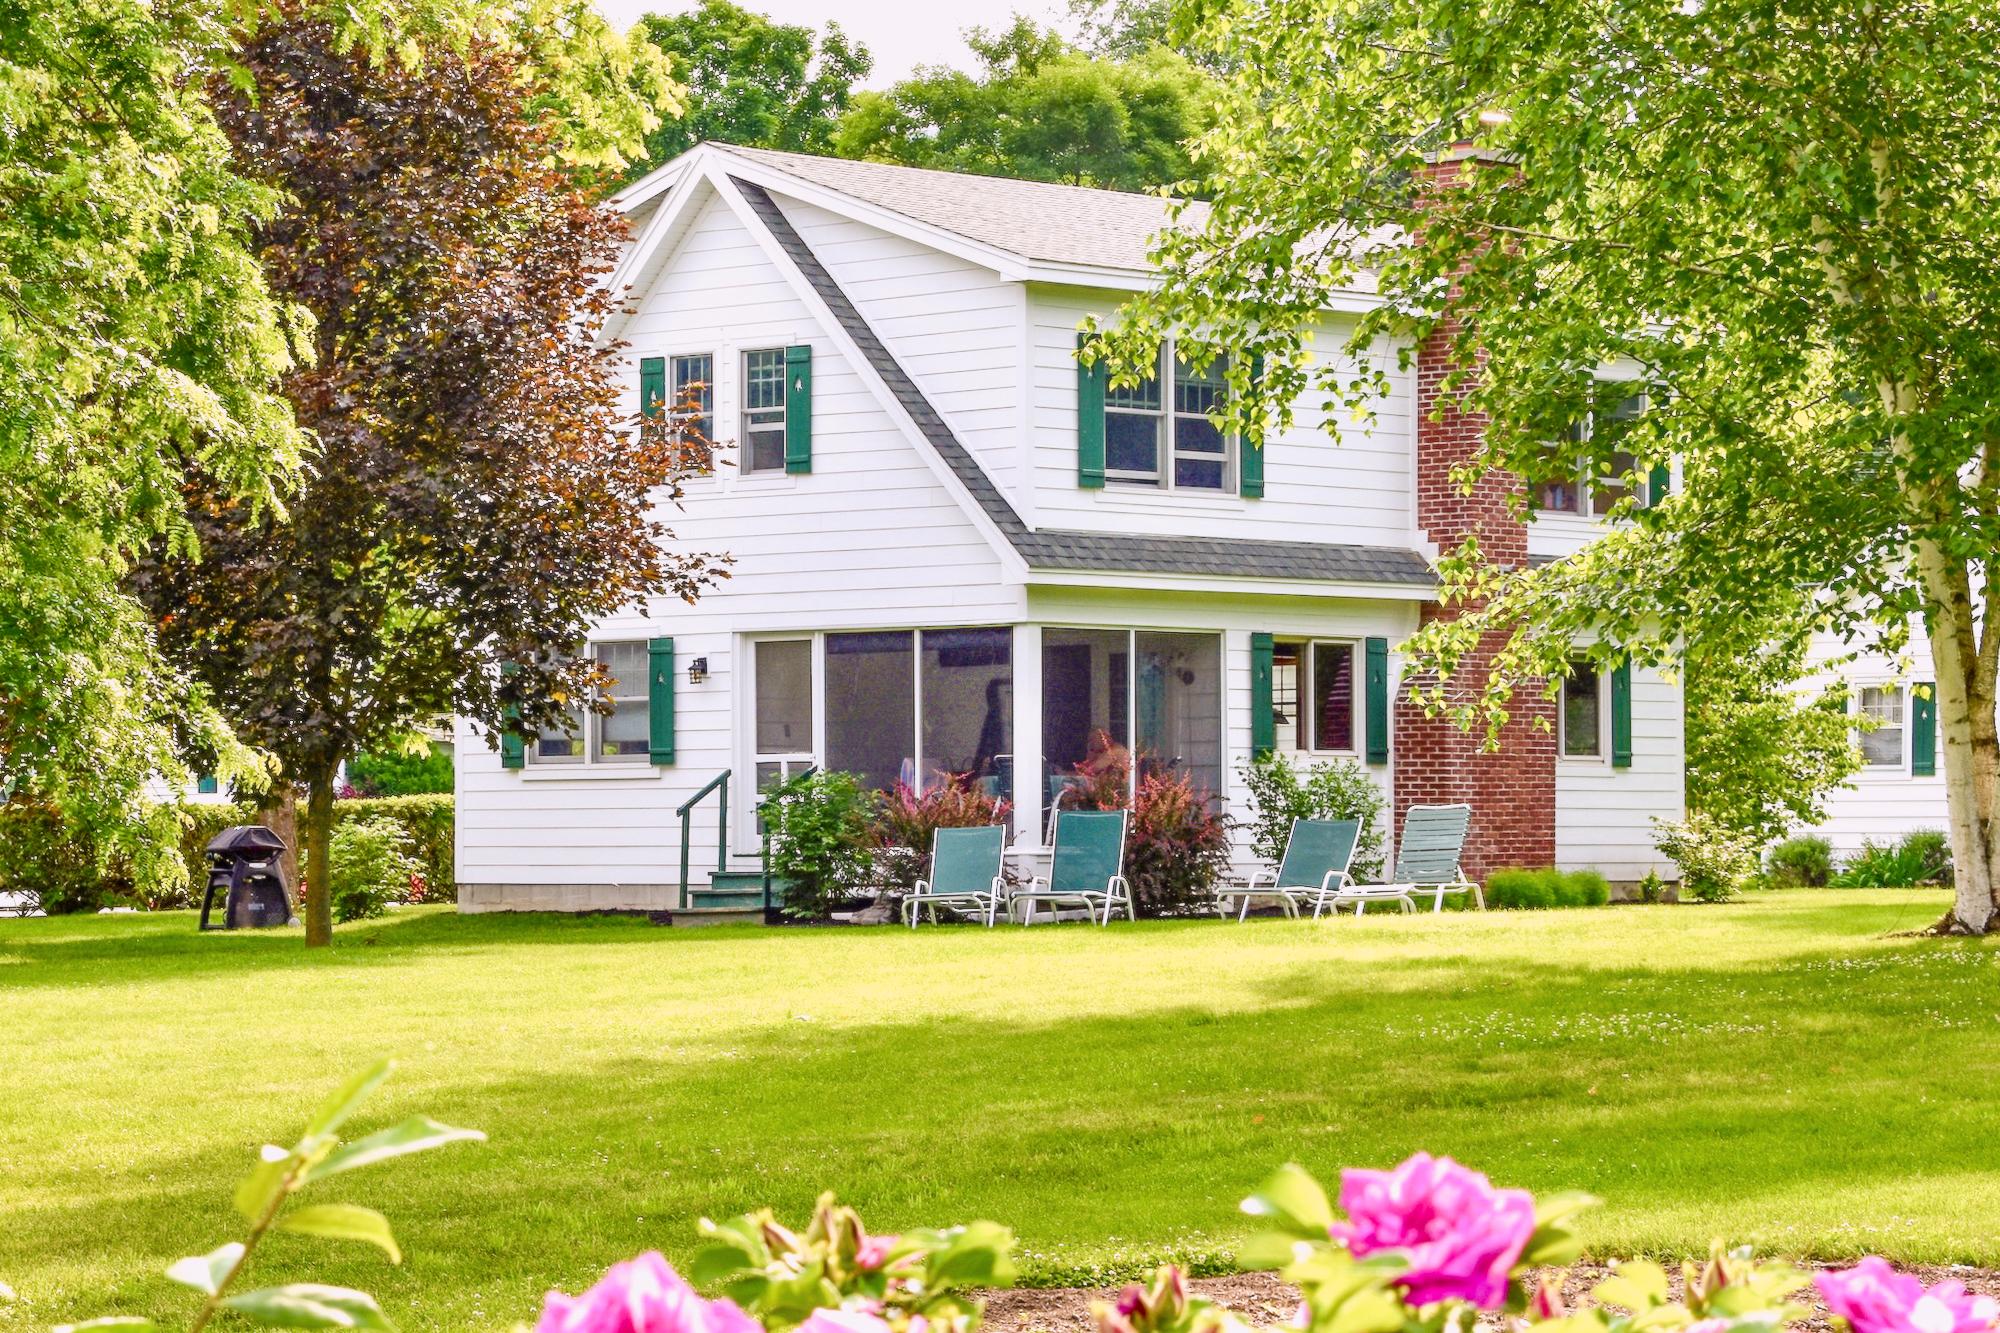 Takundewide Cottage #13 exterior